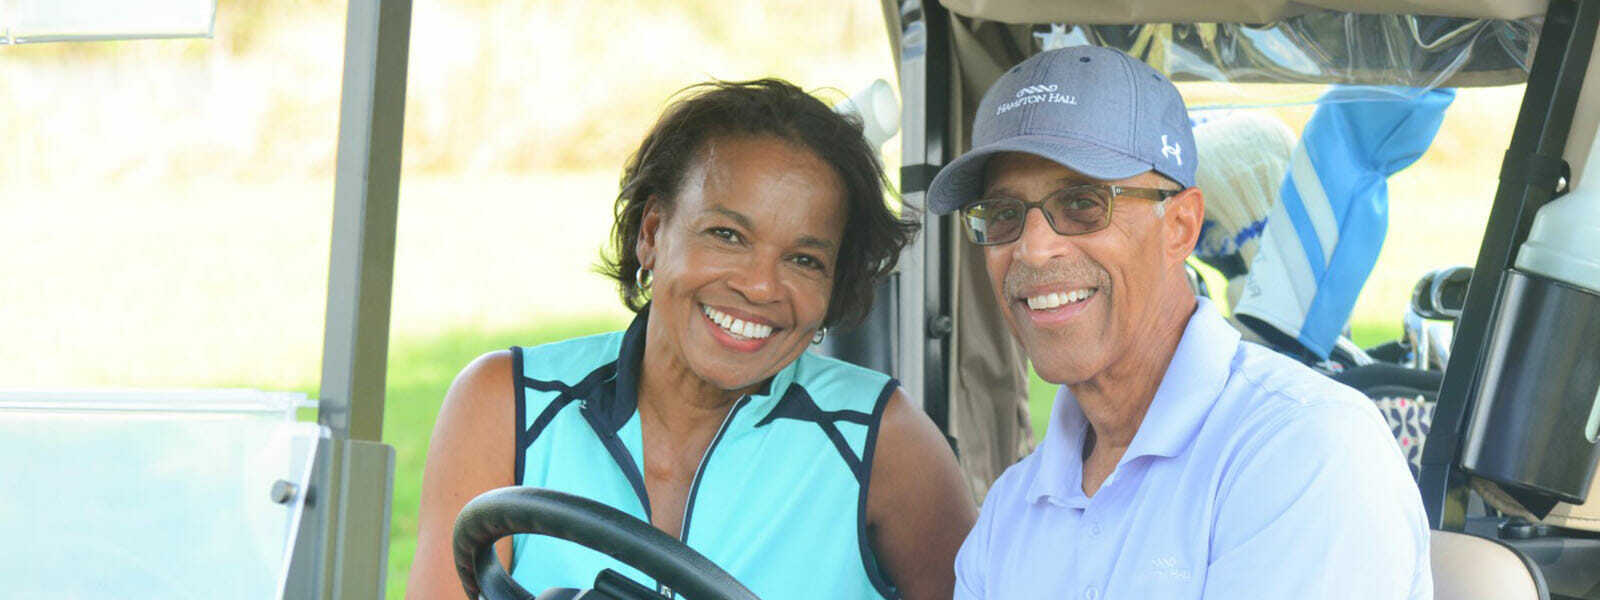 Private Gated Community Bluffton SC | Hampton Hall Club | Golf